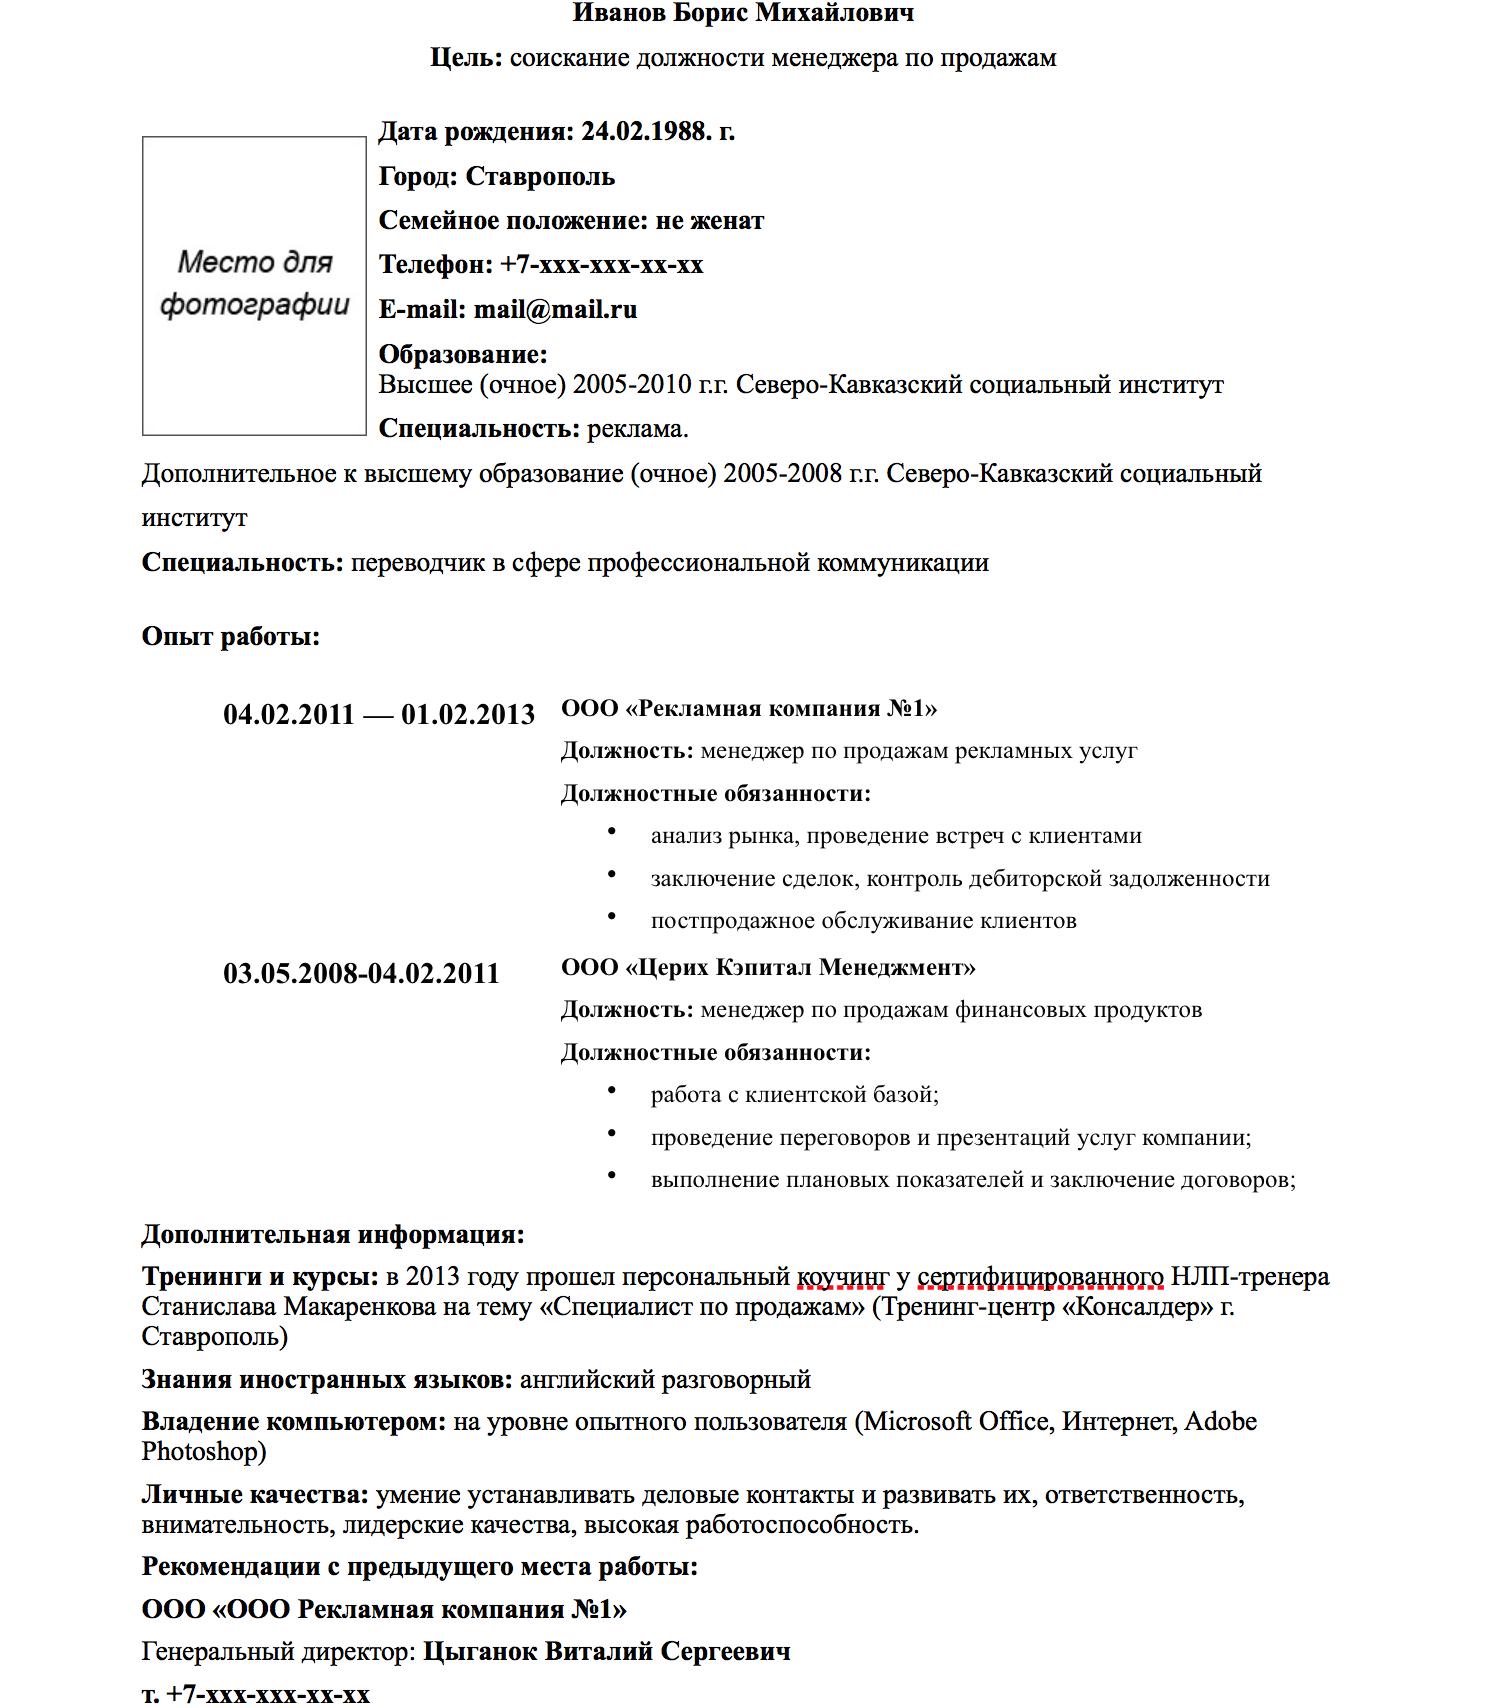 шаблон резюме менеджера